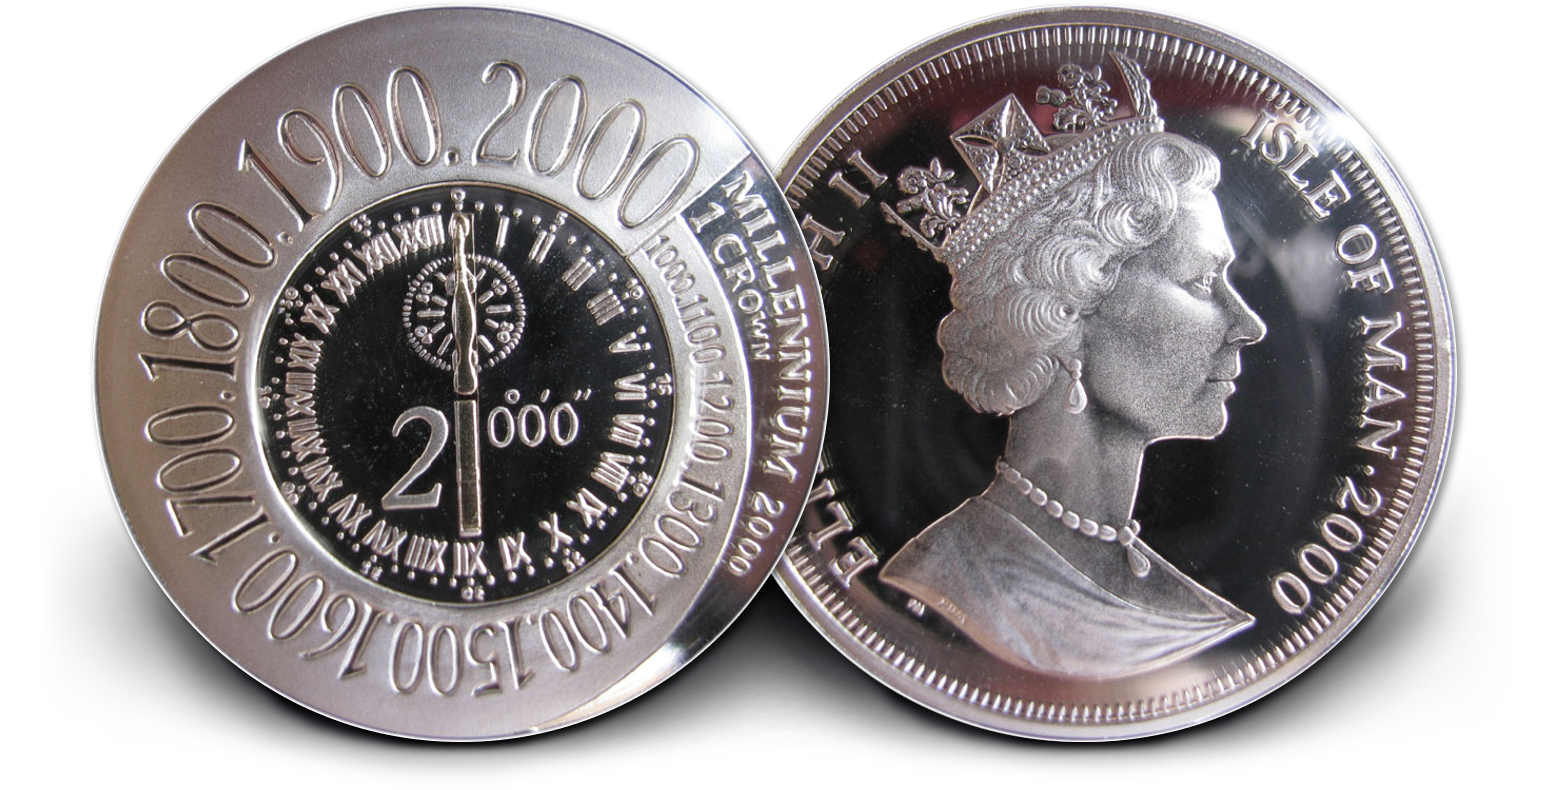 2000 Meridian Line Millennium 1oz Silver Coin